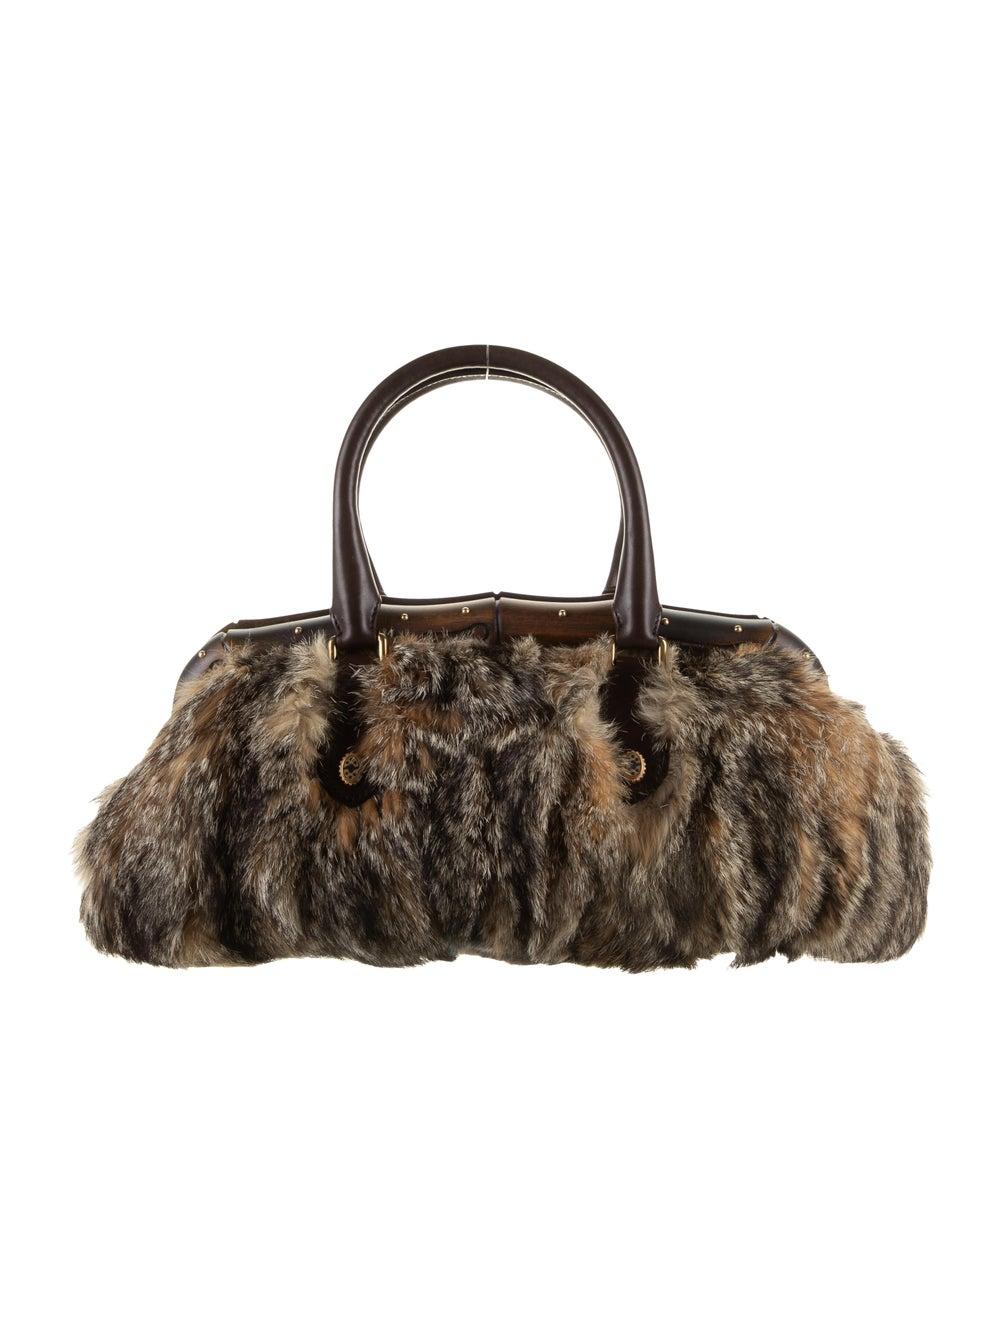 Gucci Fur Bamboo Frame Handle Bag Gold - image 1